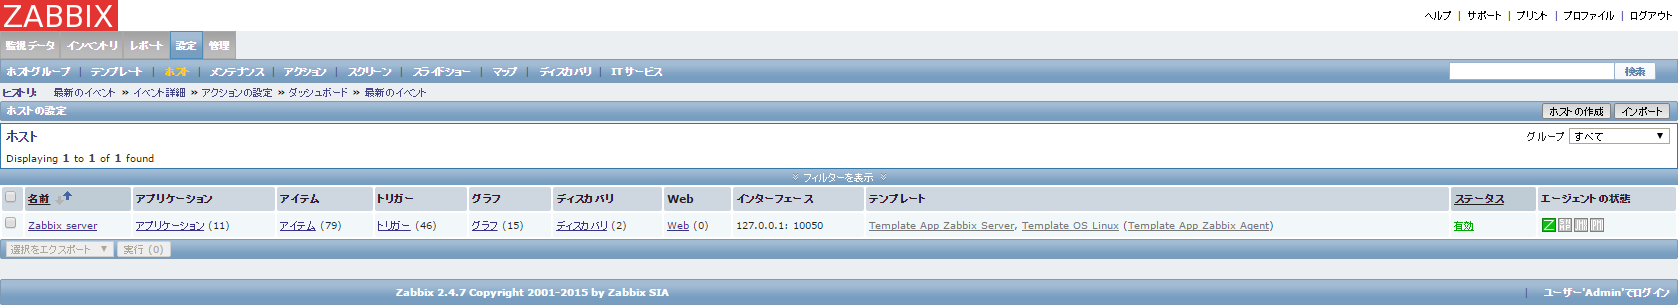 Zabbixログ監視 - ホストの設定.png